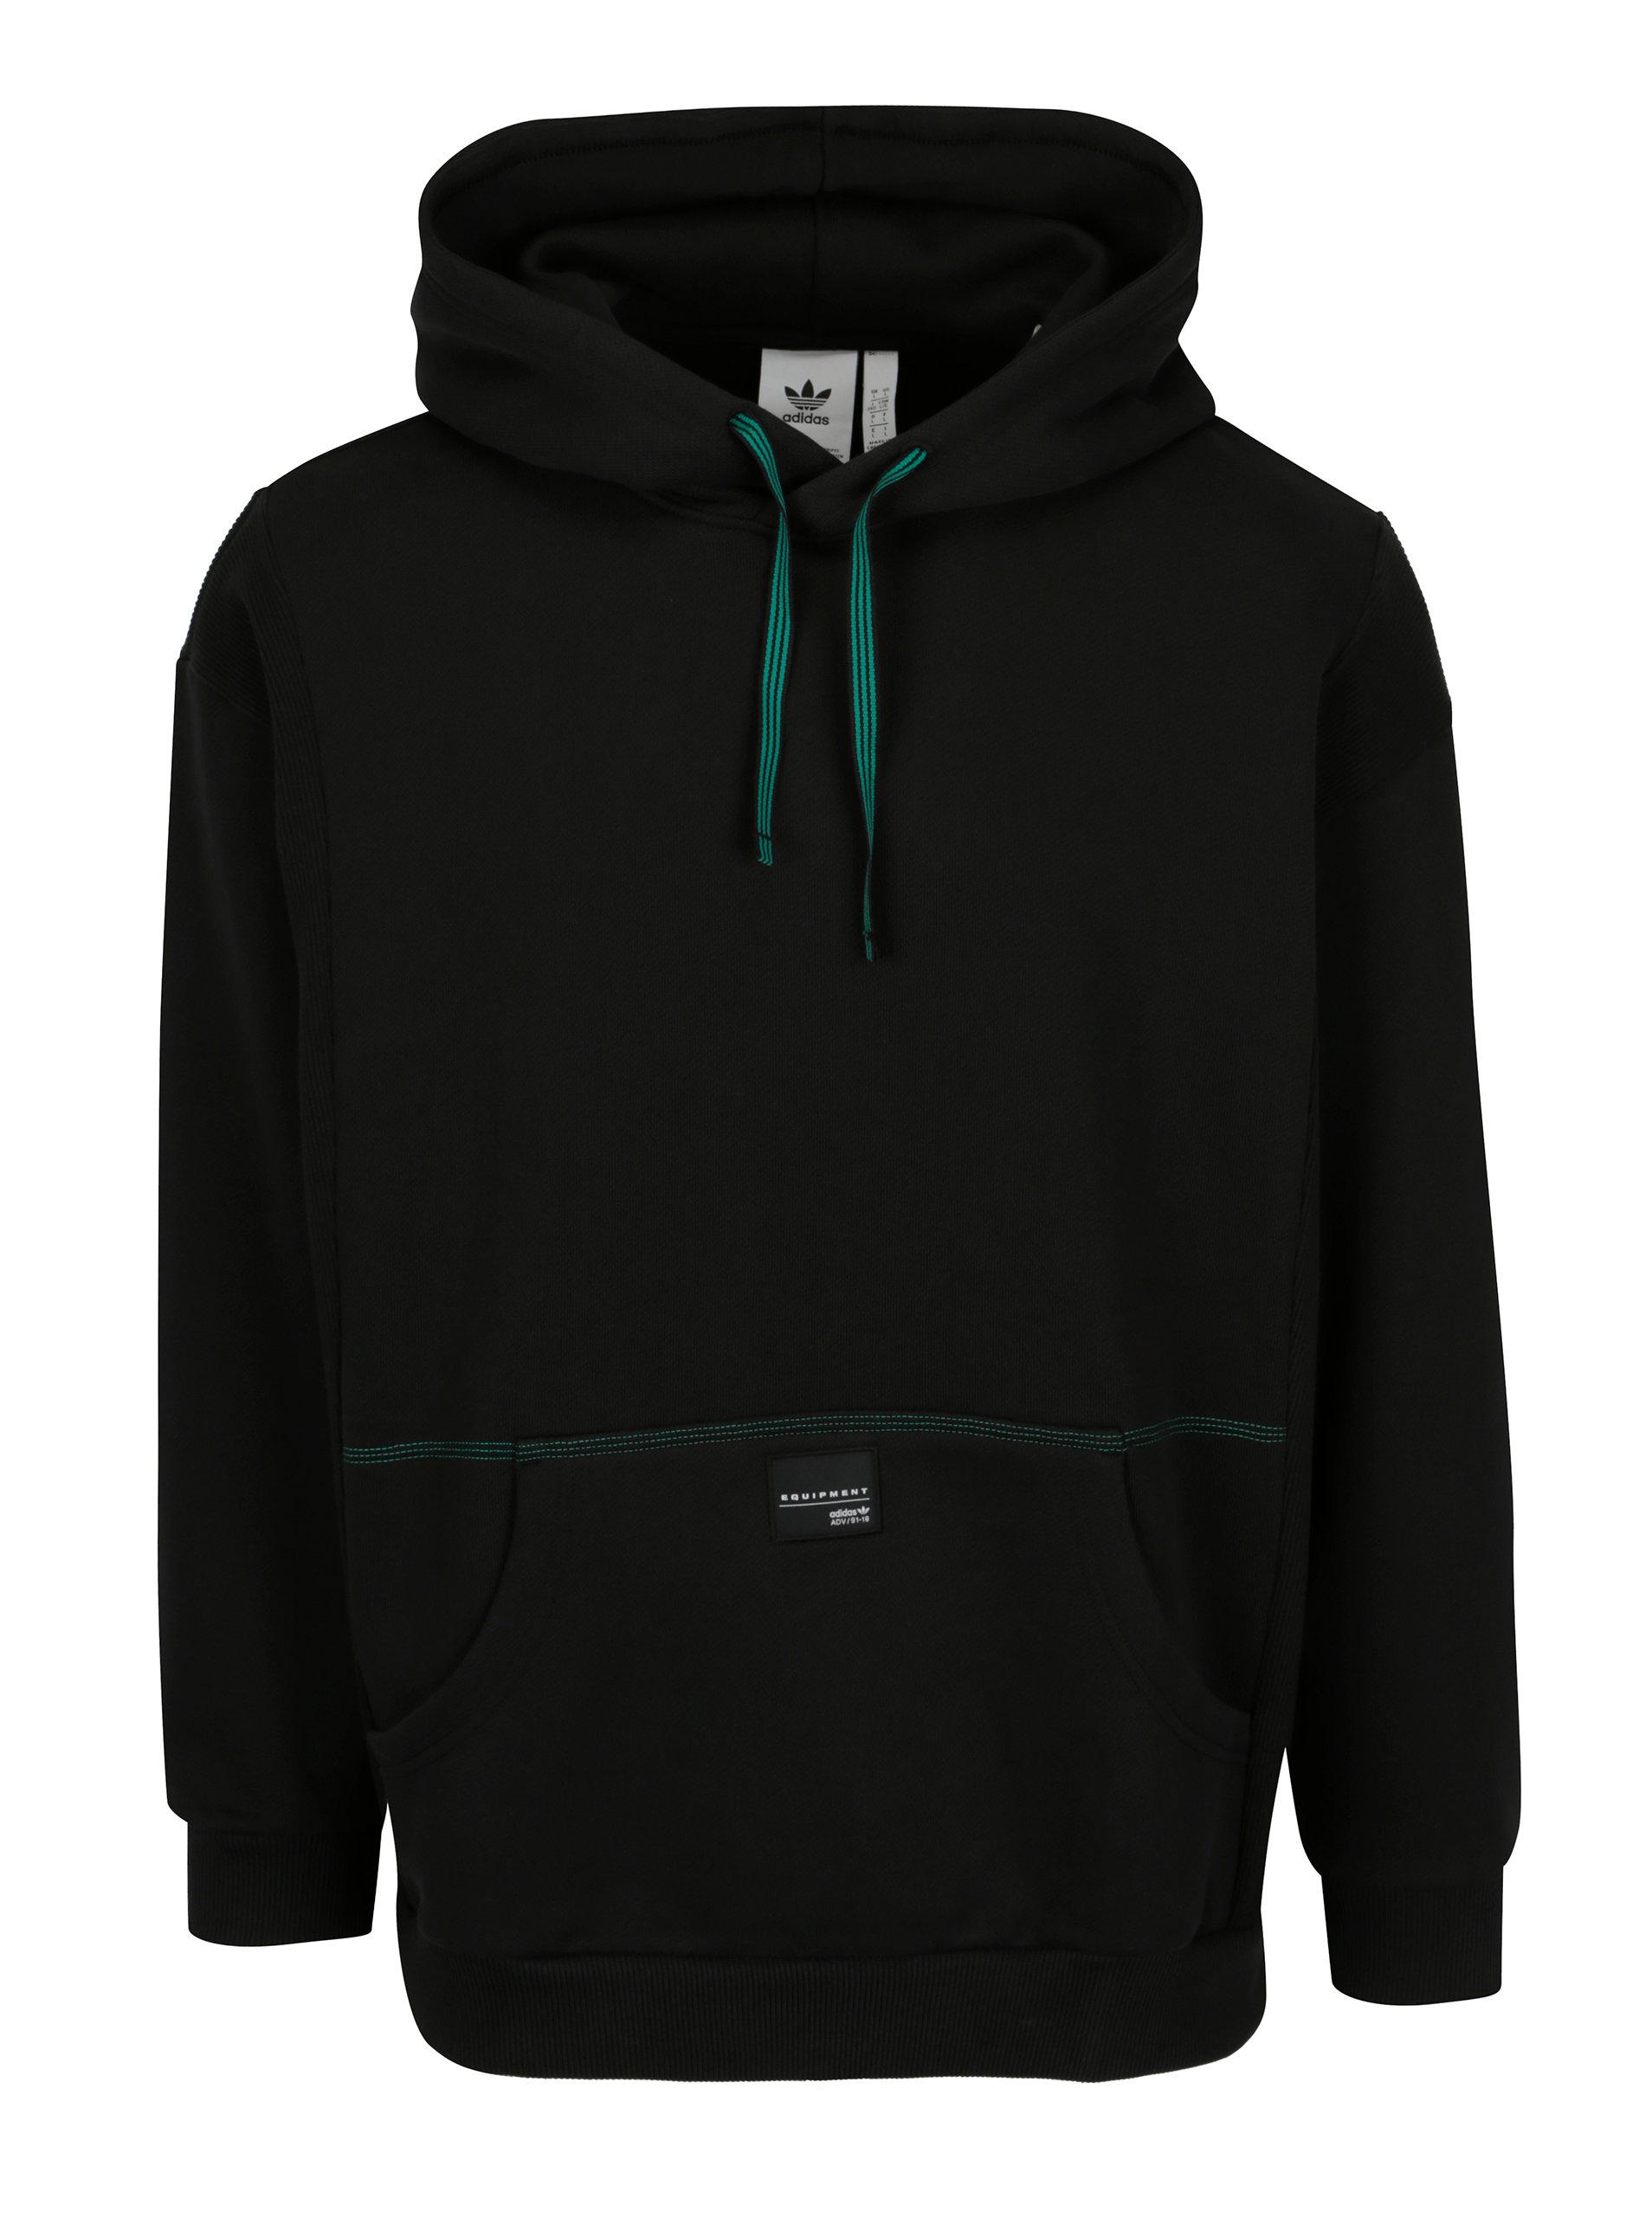 Černá pánská mikina s kapucí adidas Originals ... d6f2e0d4ac